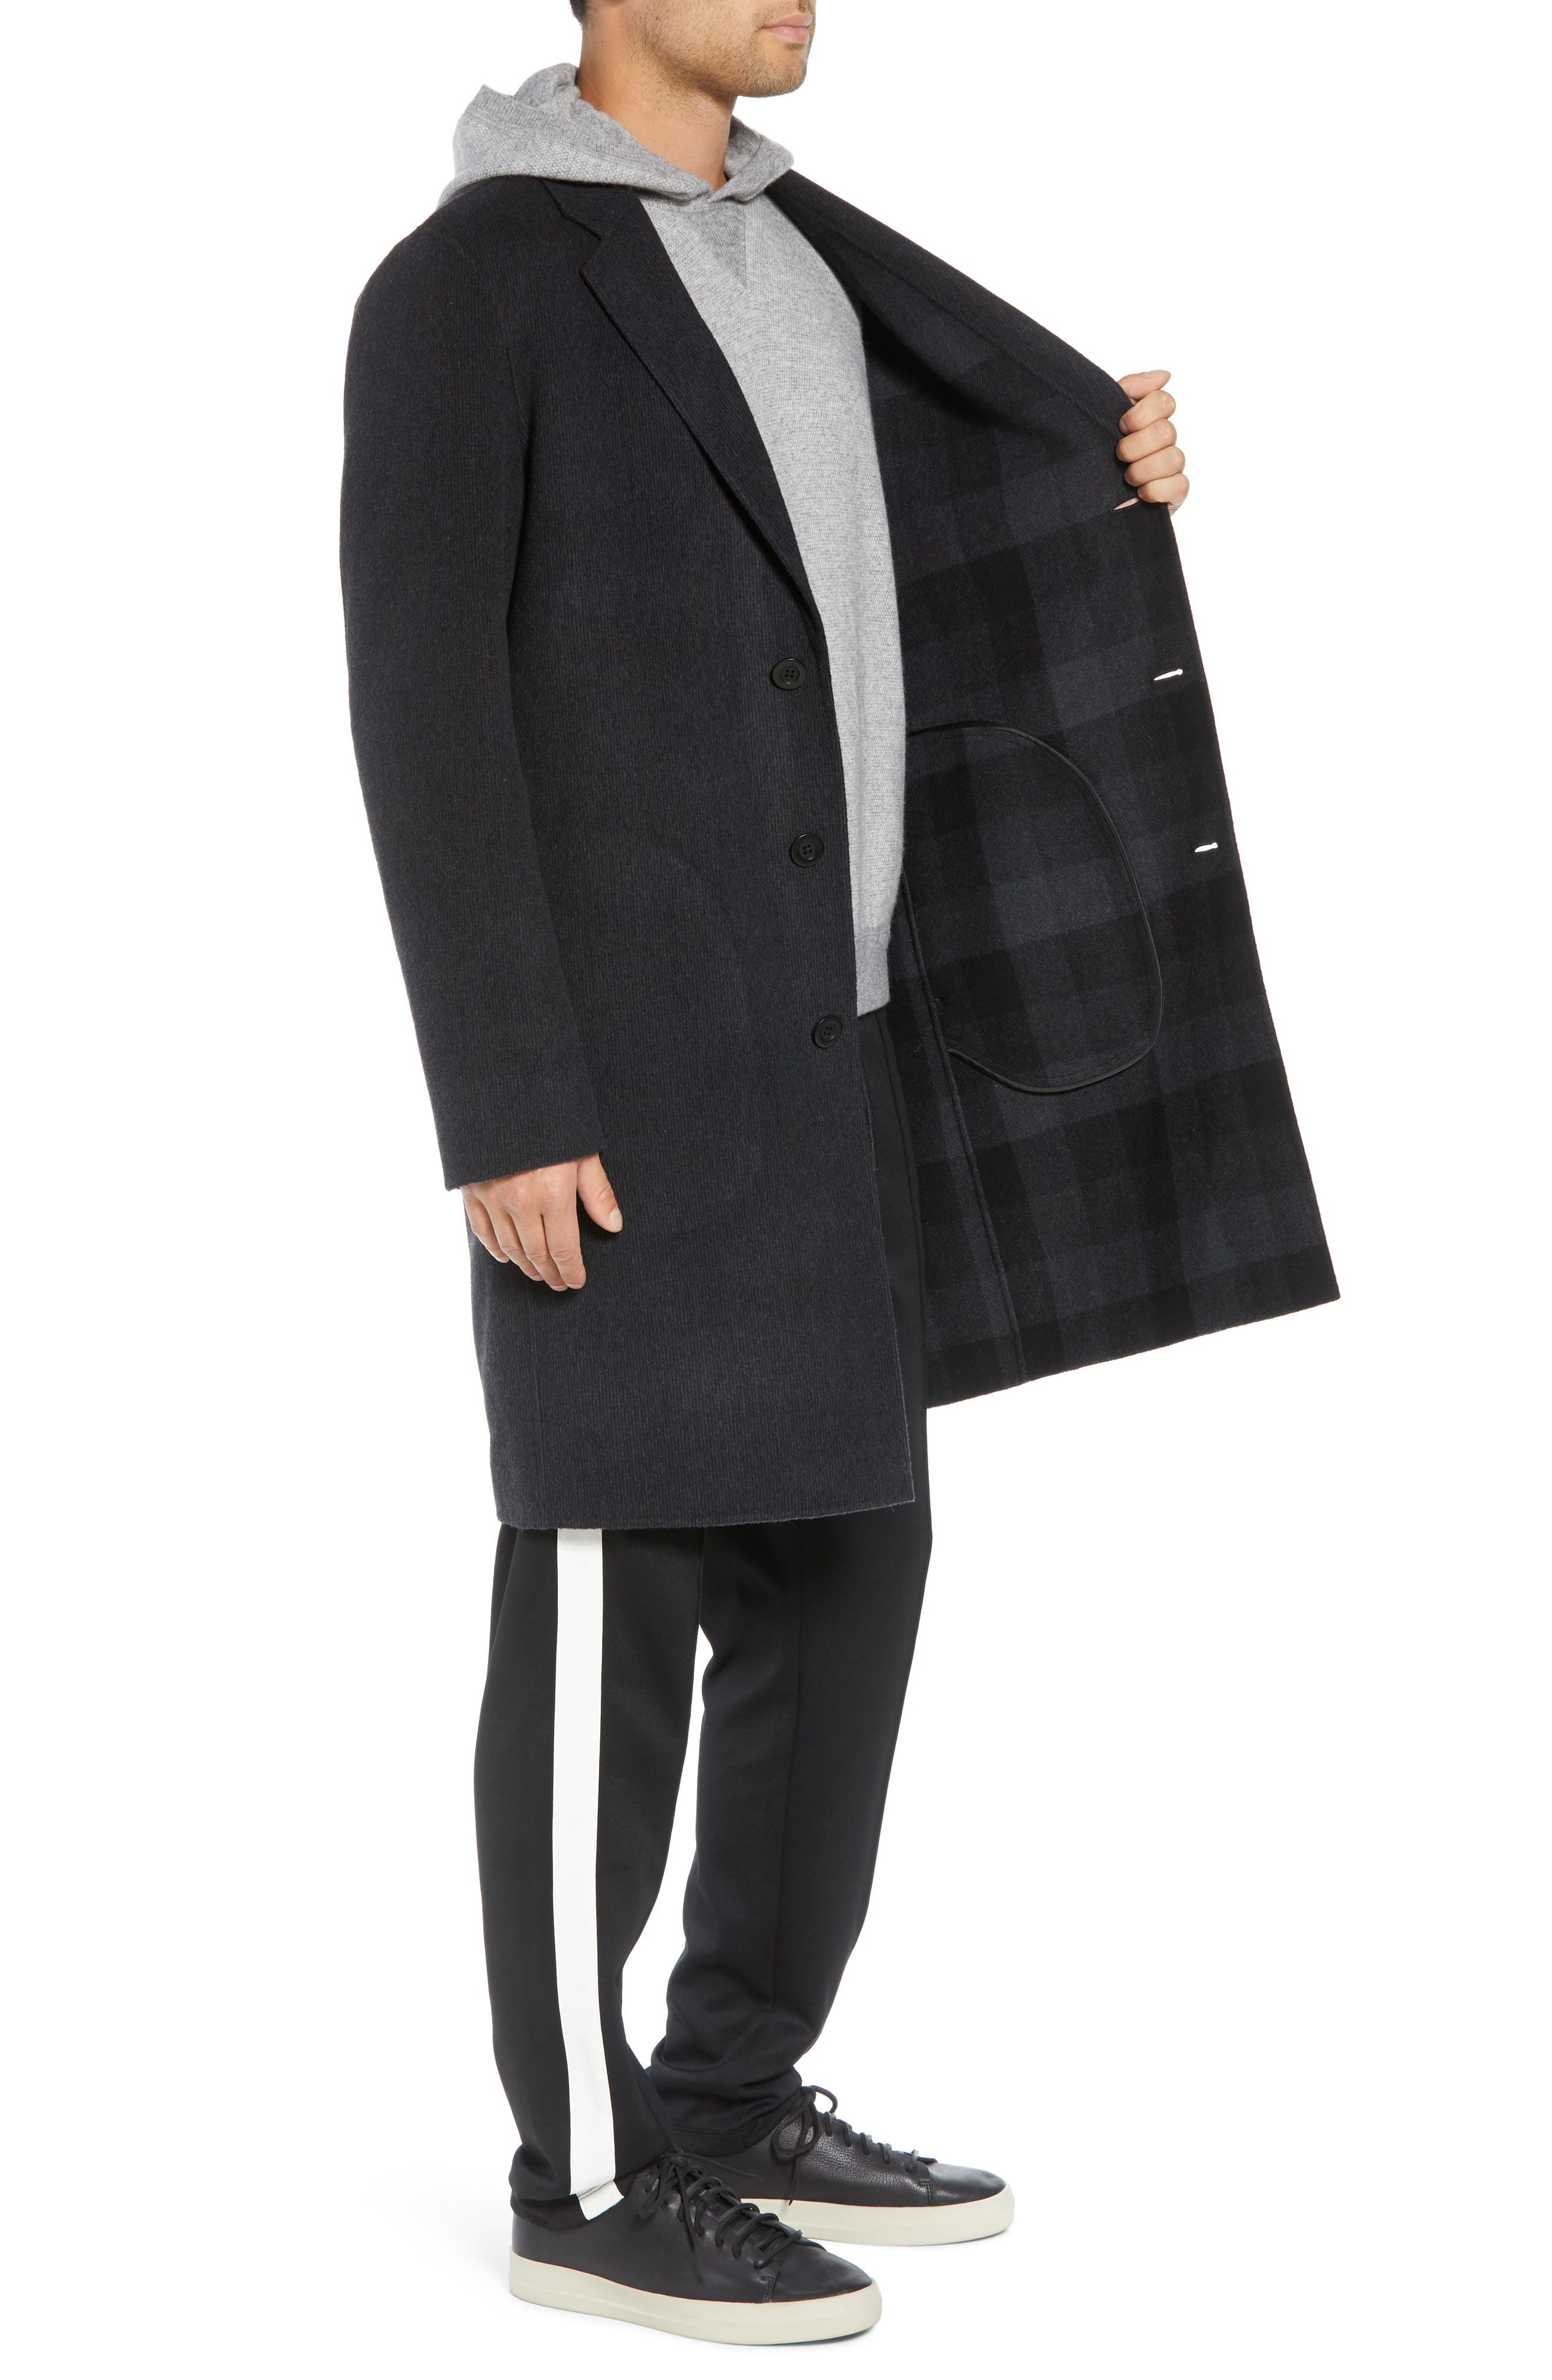 Wool Blend Car Coat,                             Alternate thumbnail 3, color,                             BLACK/ H CHARCOAL